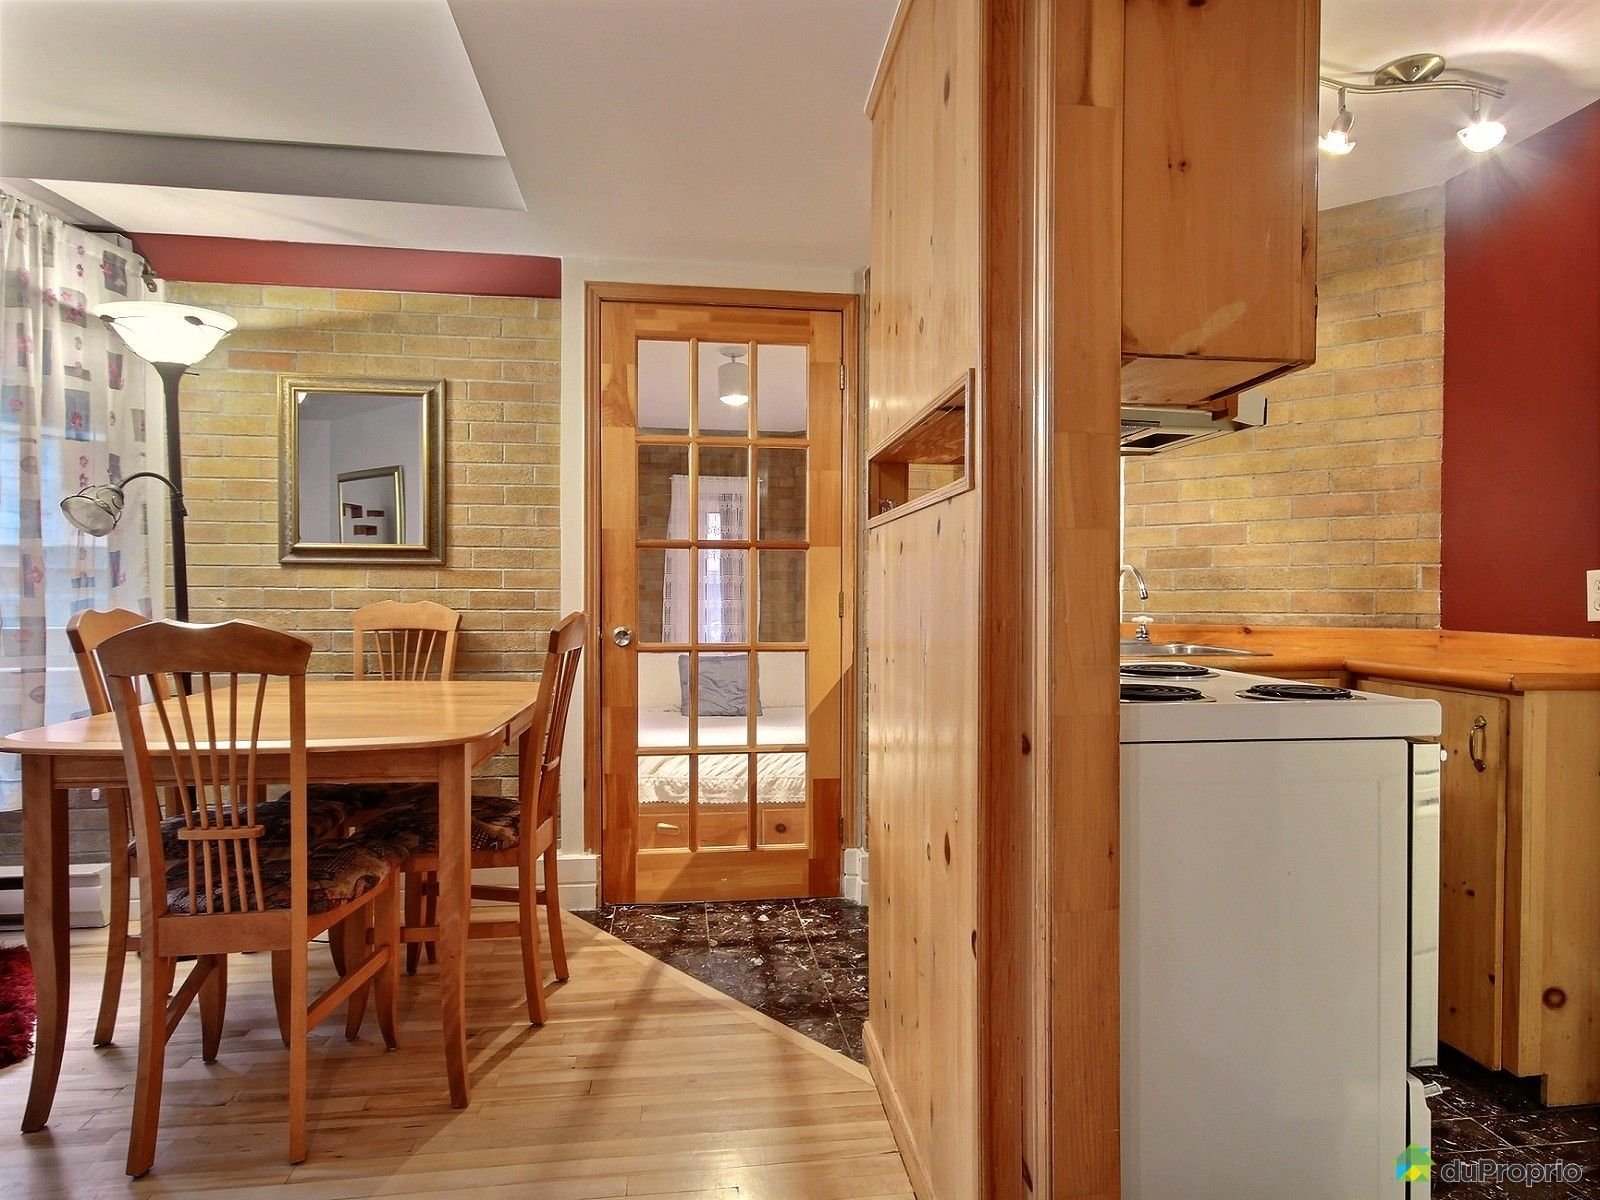 condo vendre vieux qu bec 215 936 rue des prairies immobilier qu bec duproprio 652385. Black Bedroom Furniture Sets. Home Design Ideas